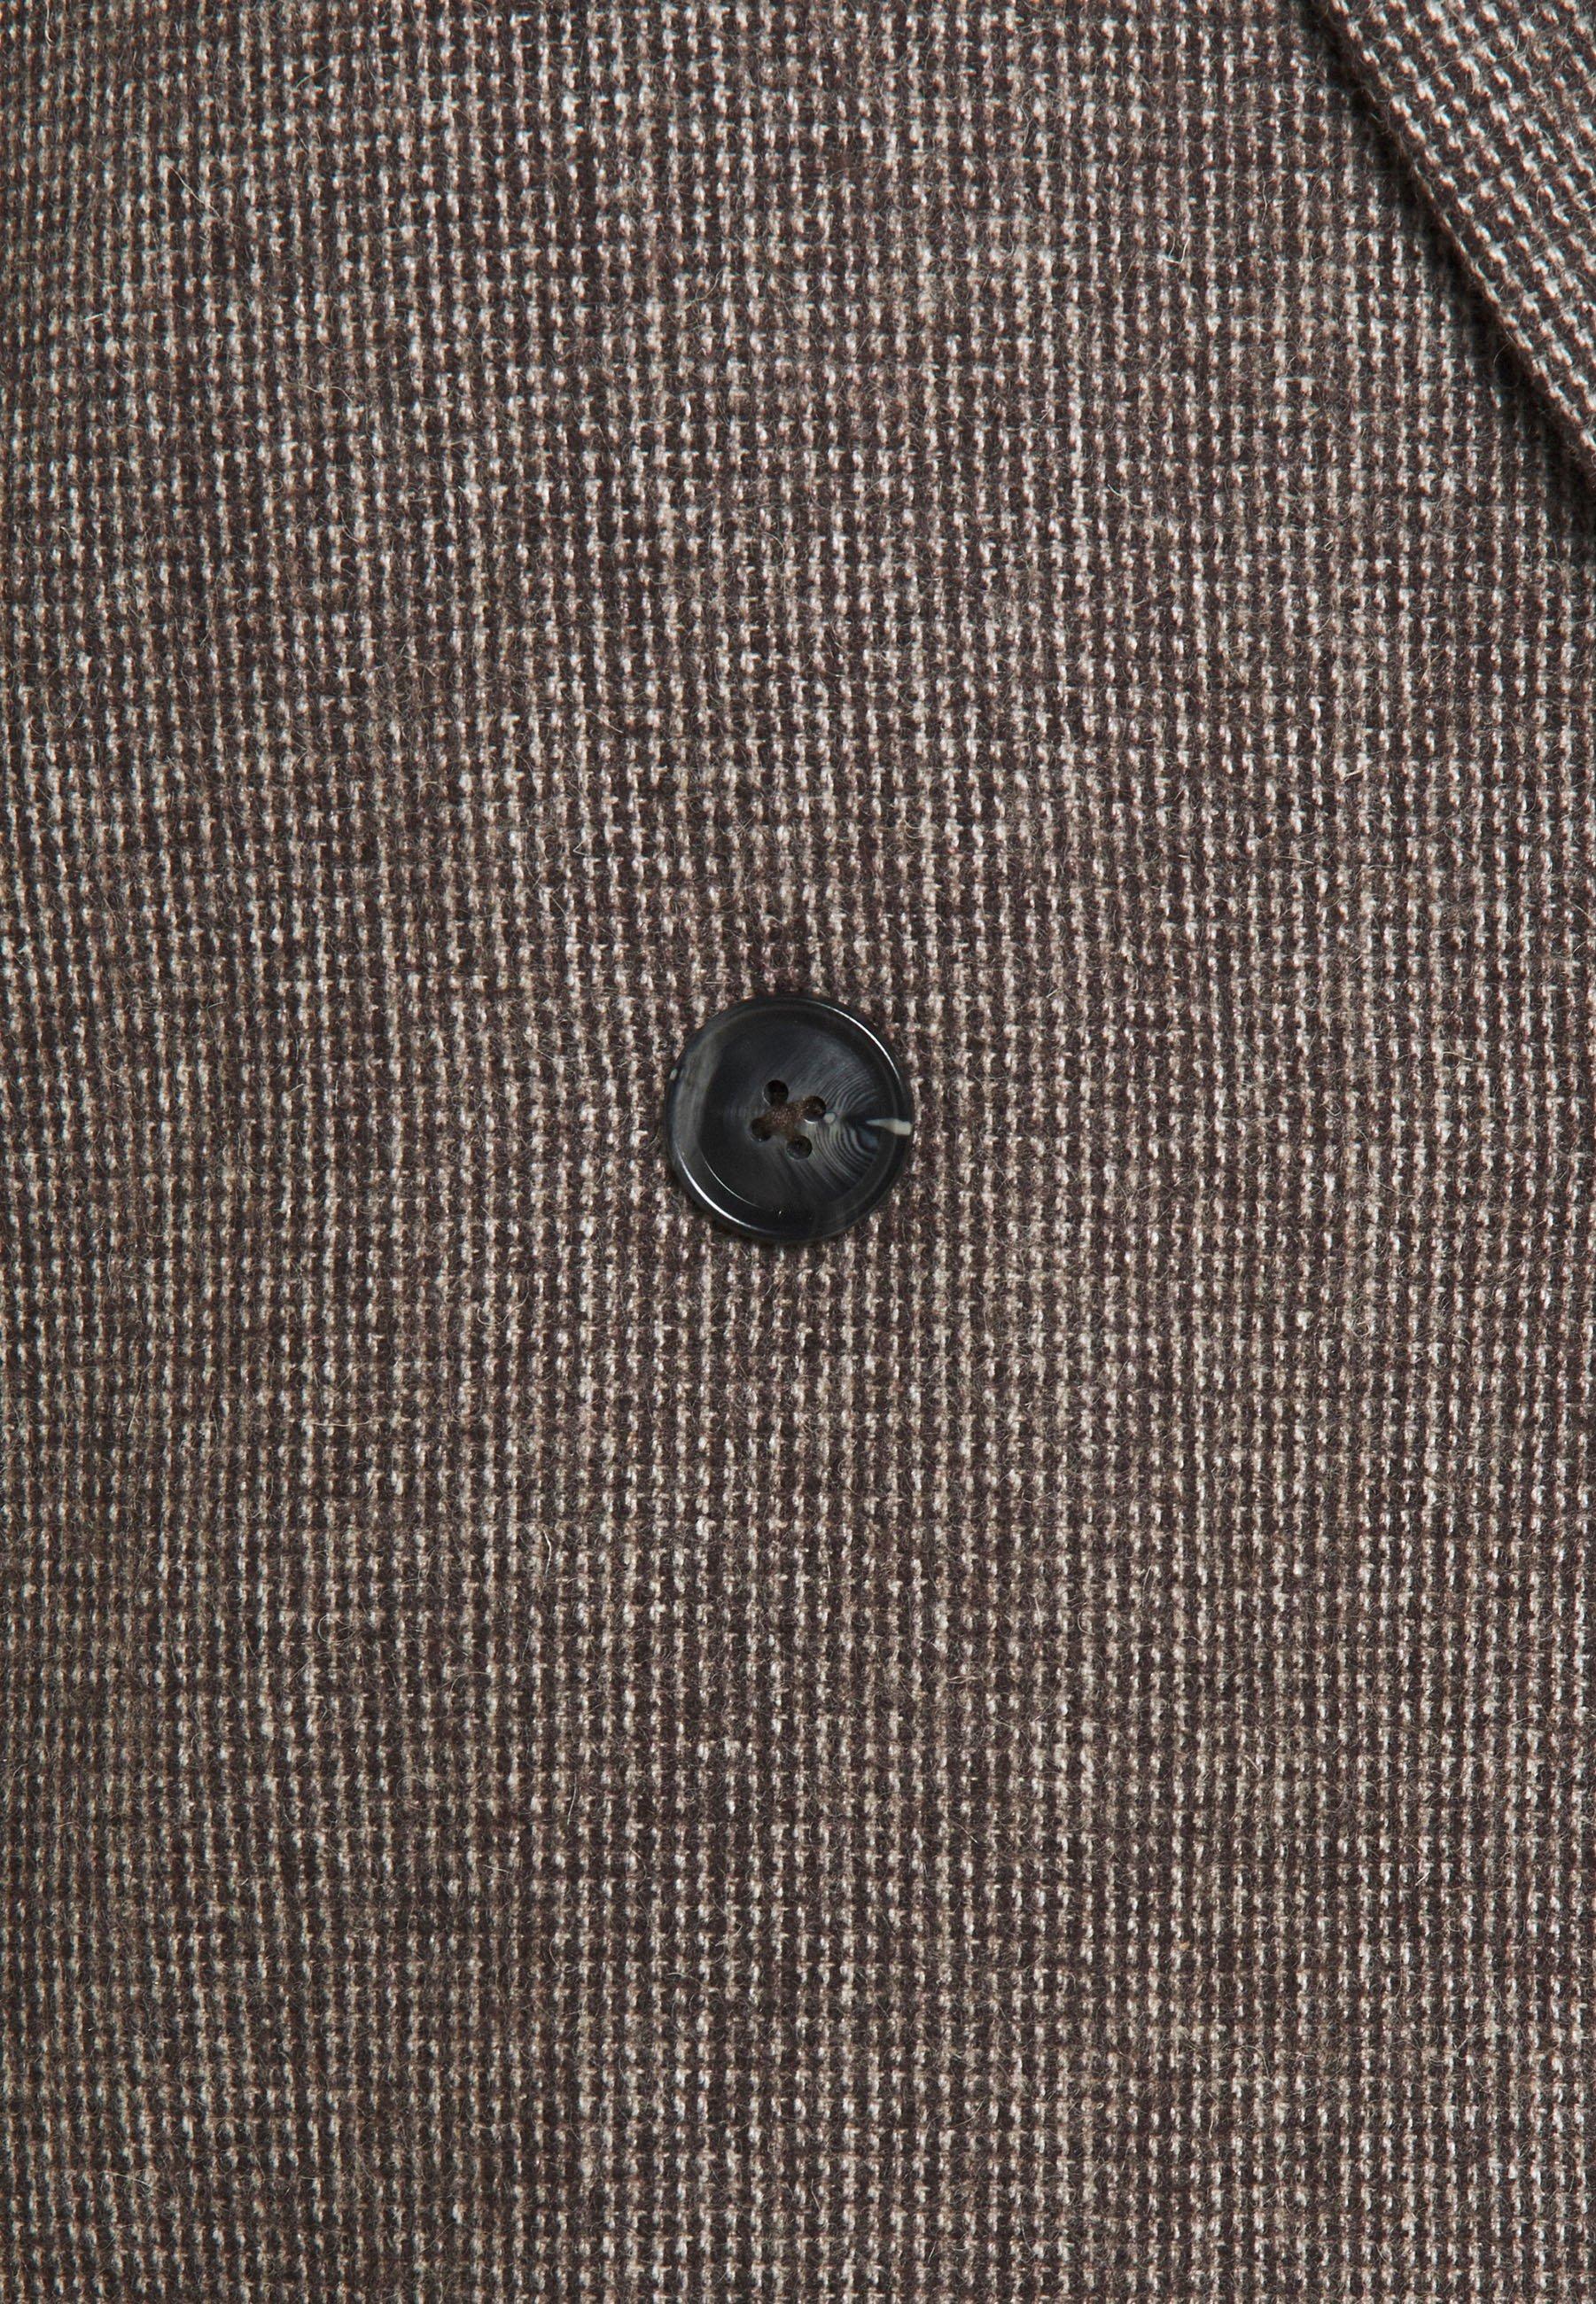 Third Form OVERSIZED Kurzmantel dark brown/dunkelbraun